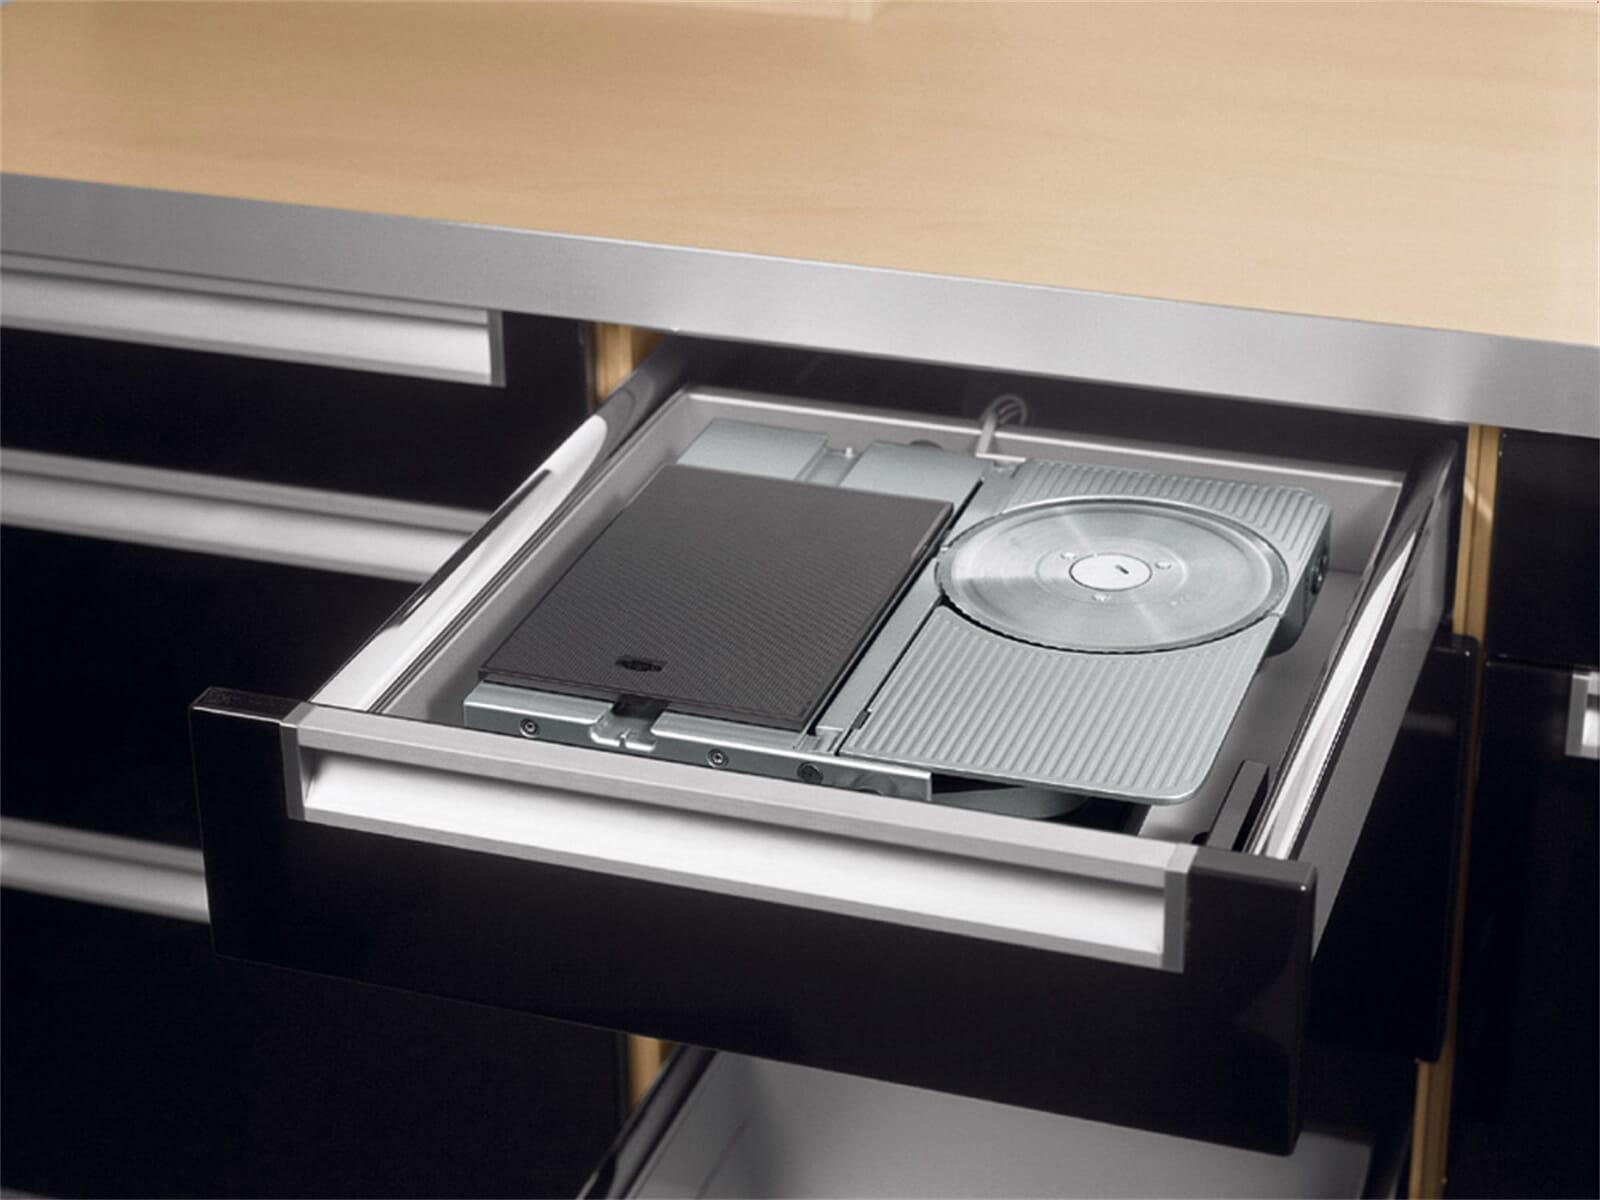 ritter aes 62 sr h multi schneider silbermetallic. Black Bedroom Furniture Sets. Home Design Ideas